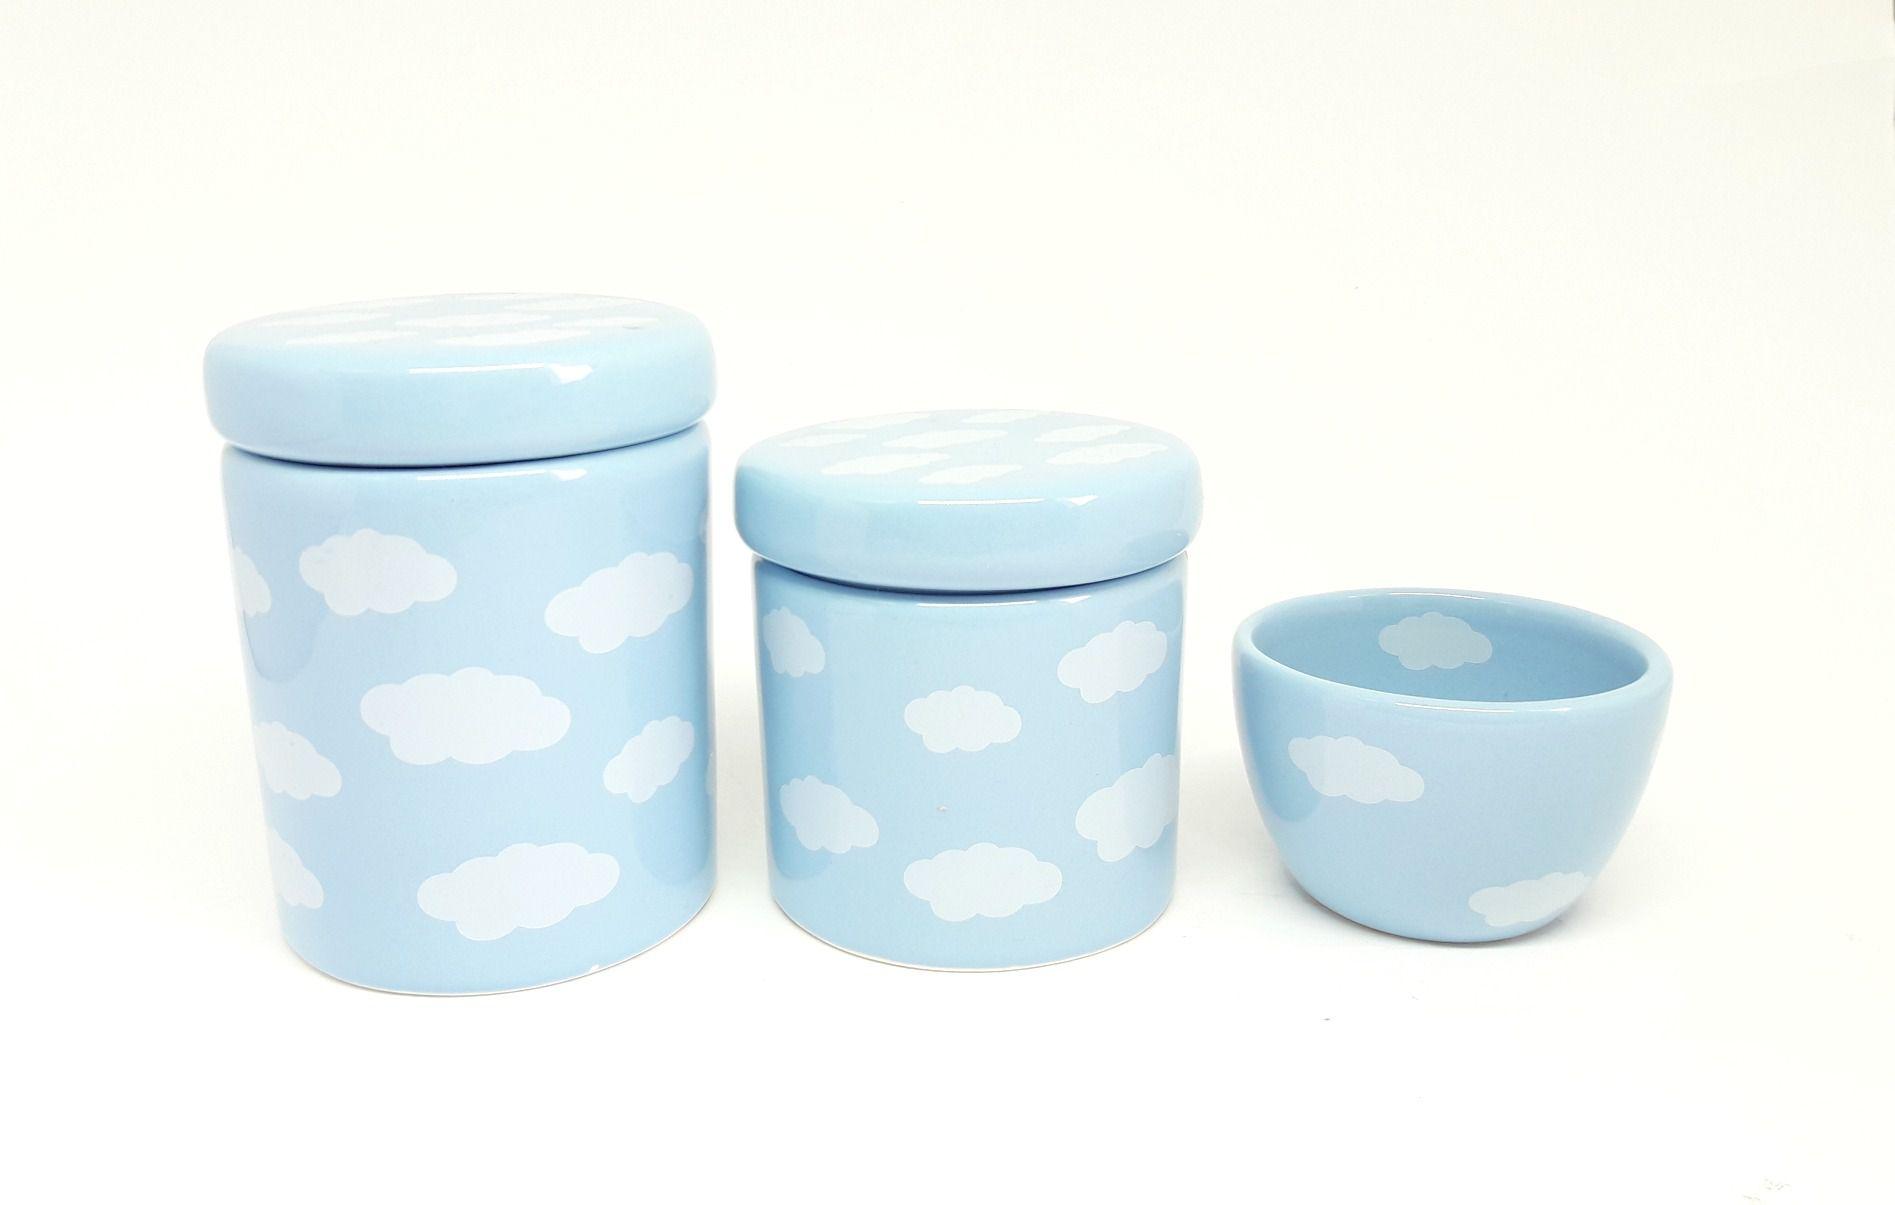 Kit Higiene Bebê Cerâmica | Nuvem | Azul | 3 Peças